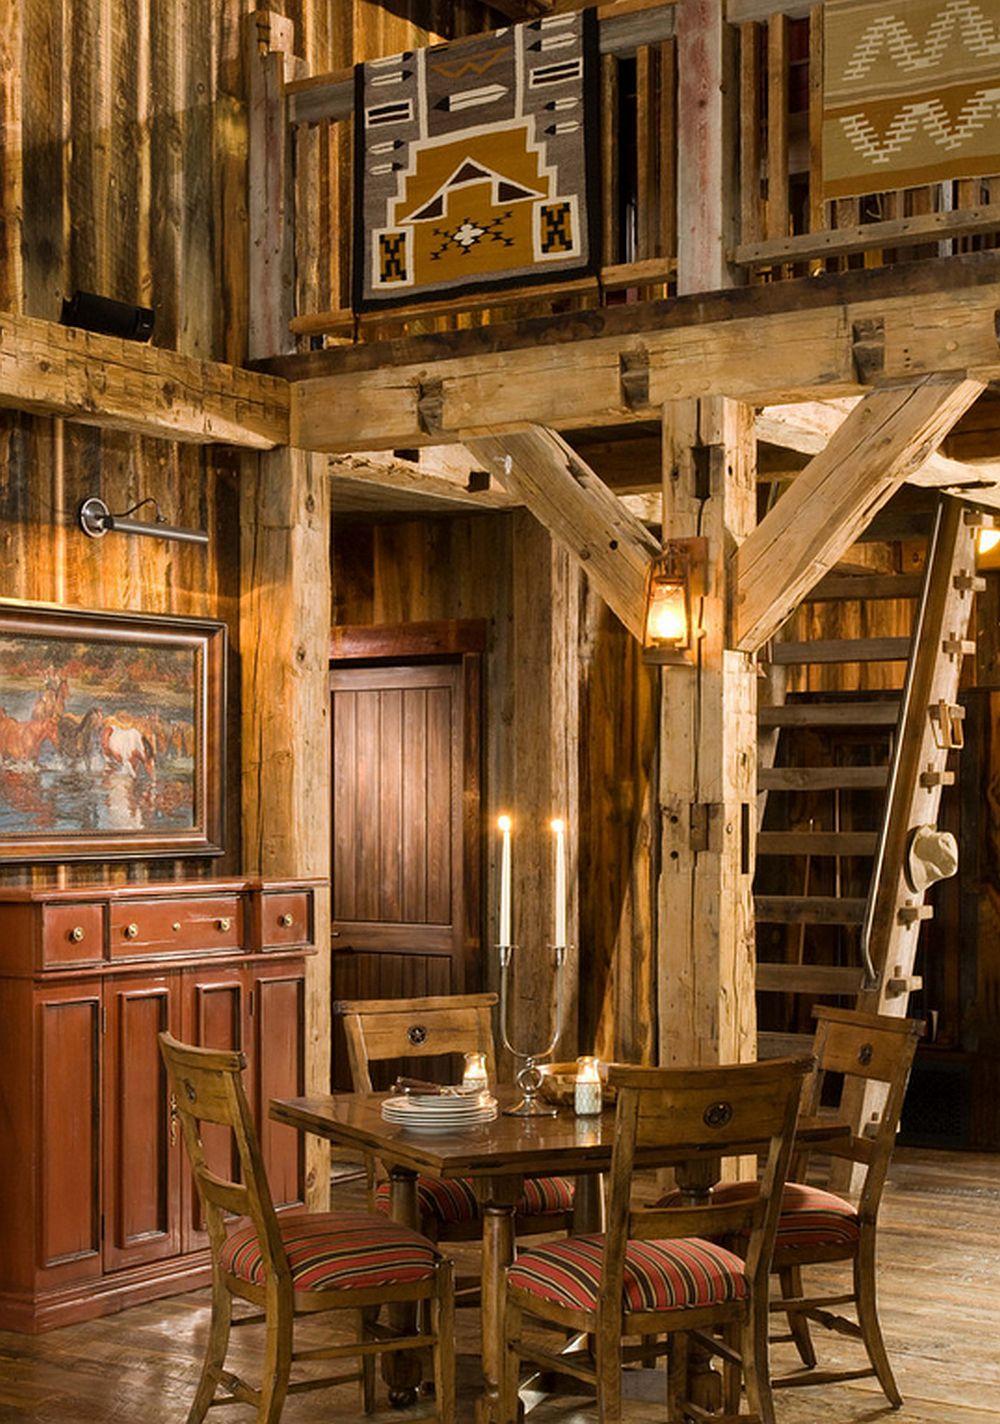 adelaparvu.com despre cabana din lemn vechi recuperat, cabana Swan Valley, Montana, RMT Architects (16)